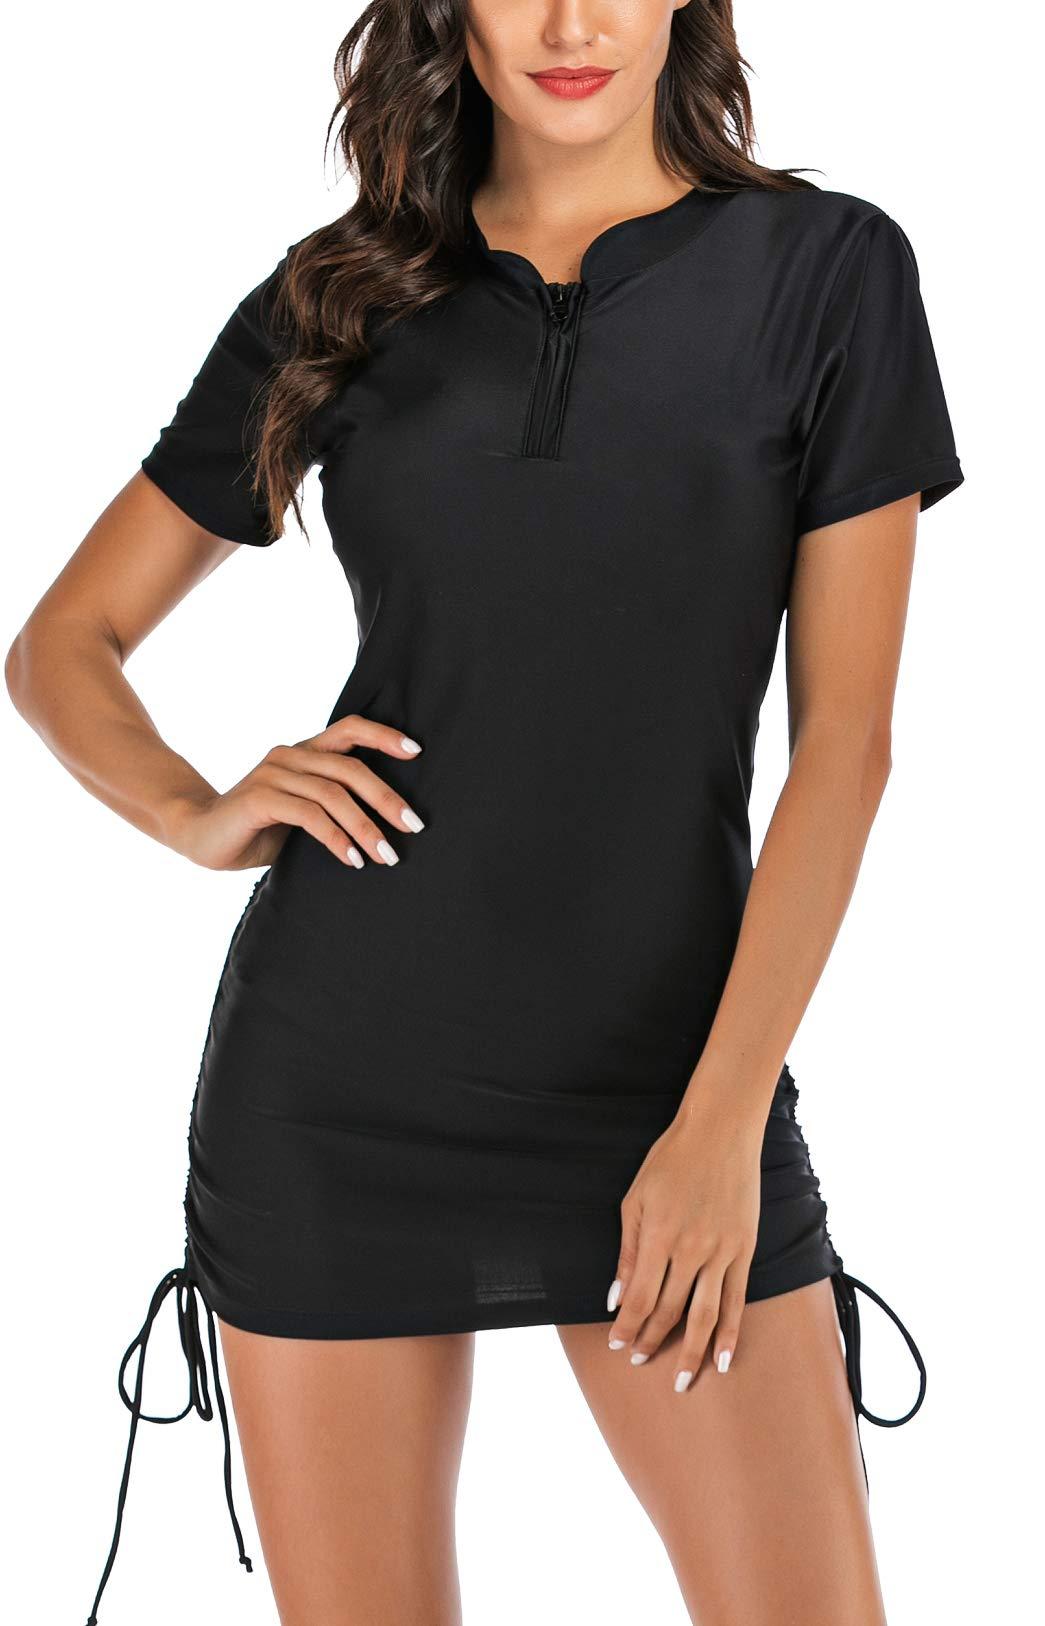 LafyKoly Women's Long Sleeve Rash Guard UV Protection Side Adjustable Swim Shirt Wetsuit Swimsuit Top